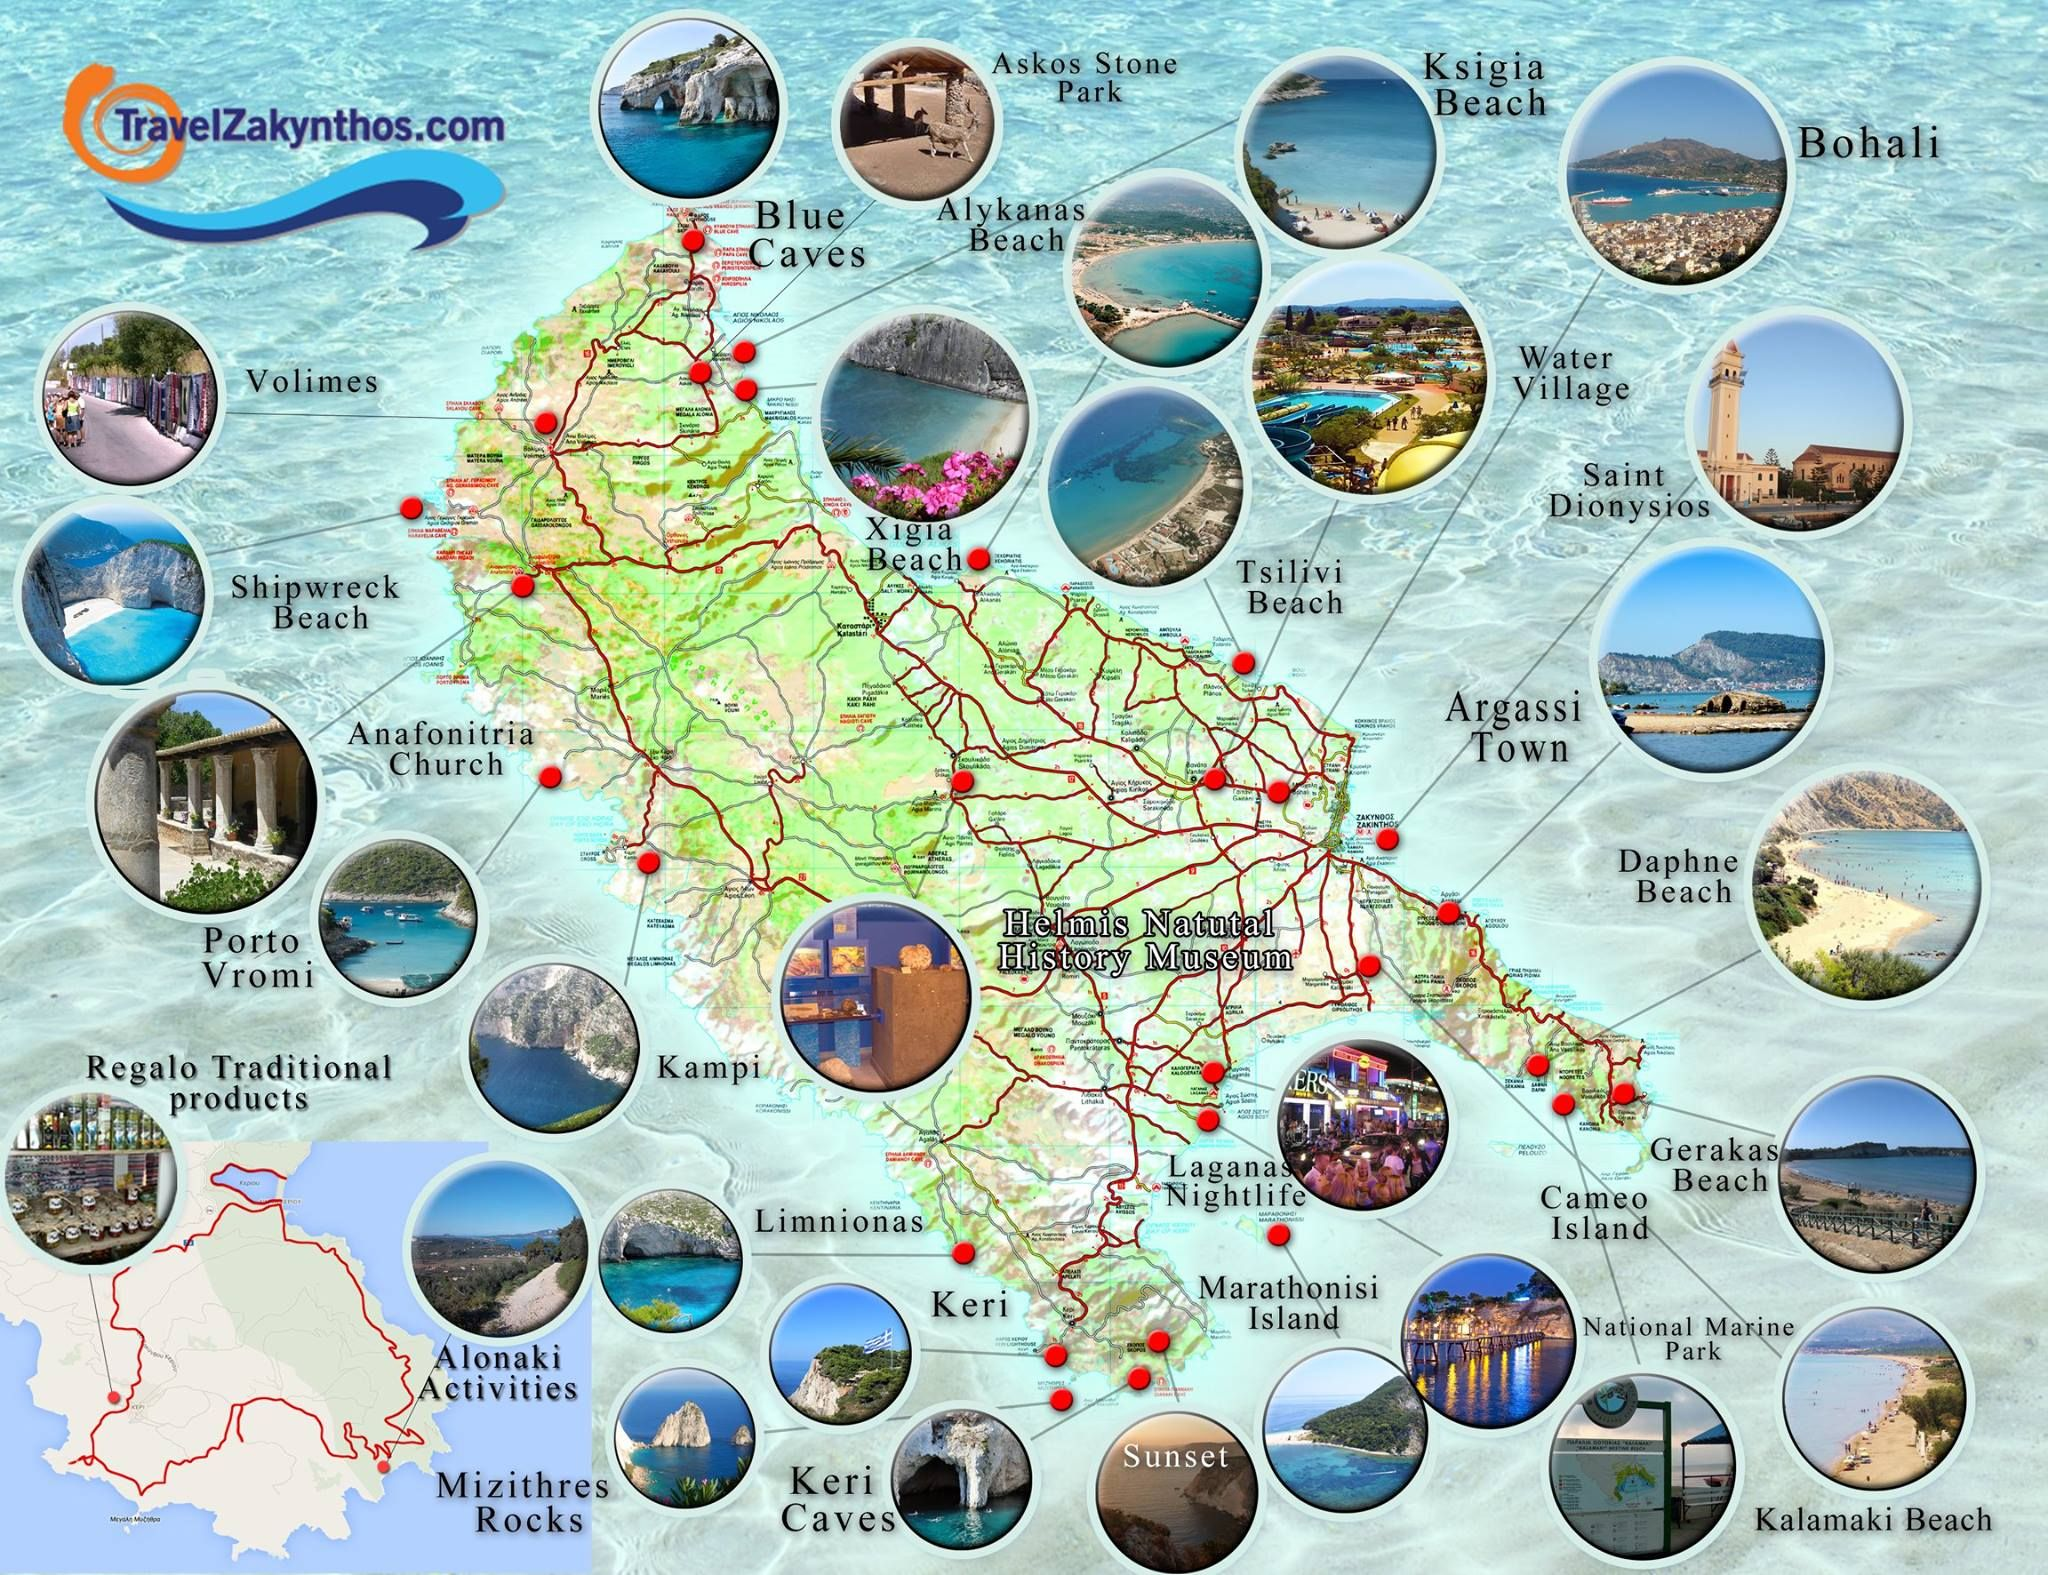 zakynthos Places to Visit Pinterest